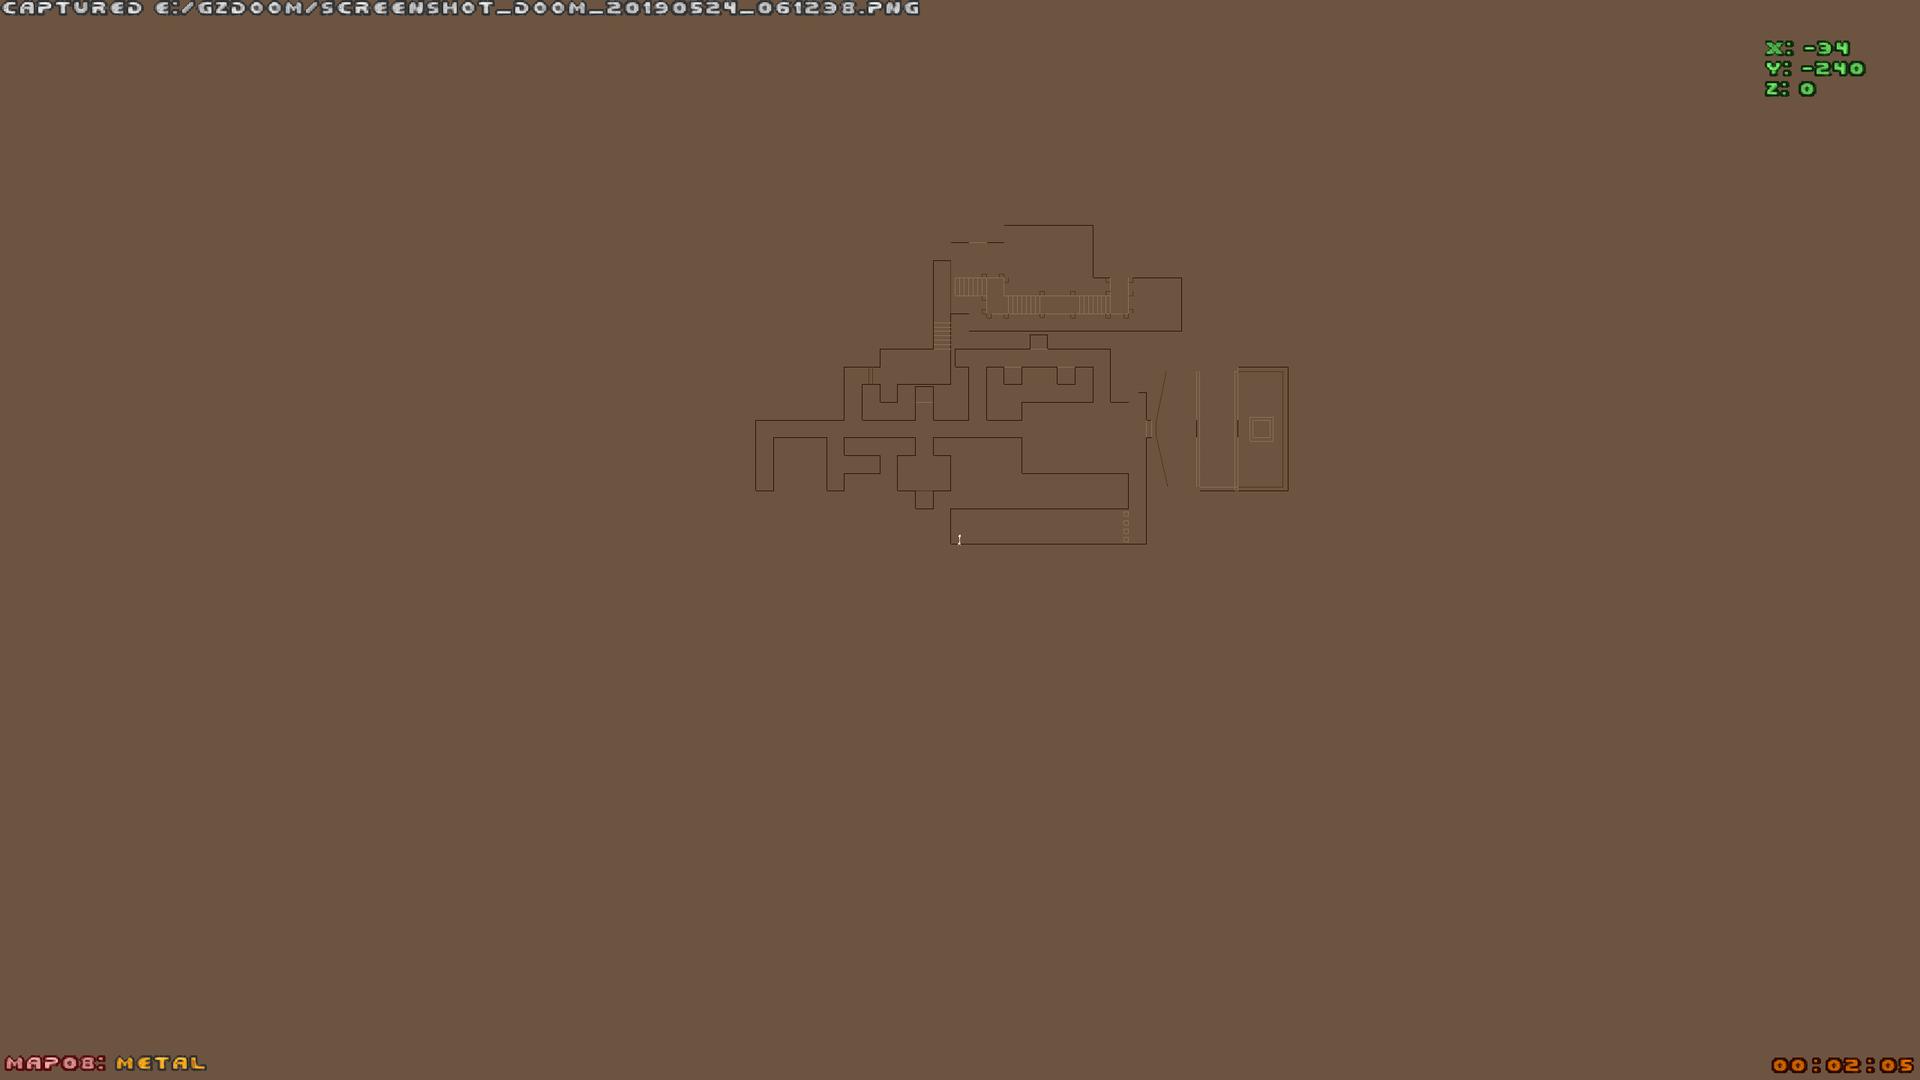 Screenshot_Doom_20190524_061240.png.7c30f7b6afe611c6b4c633838260458a.png